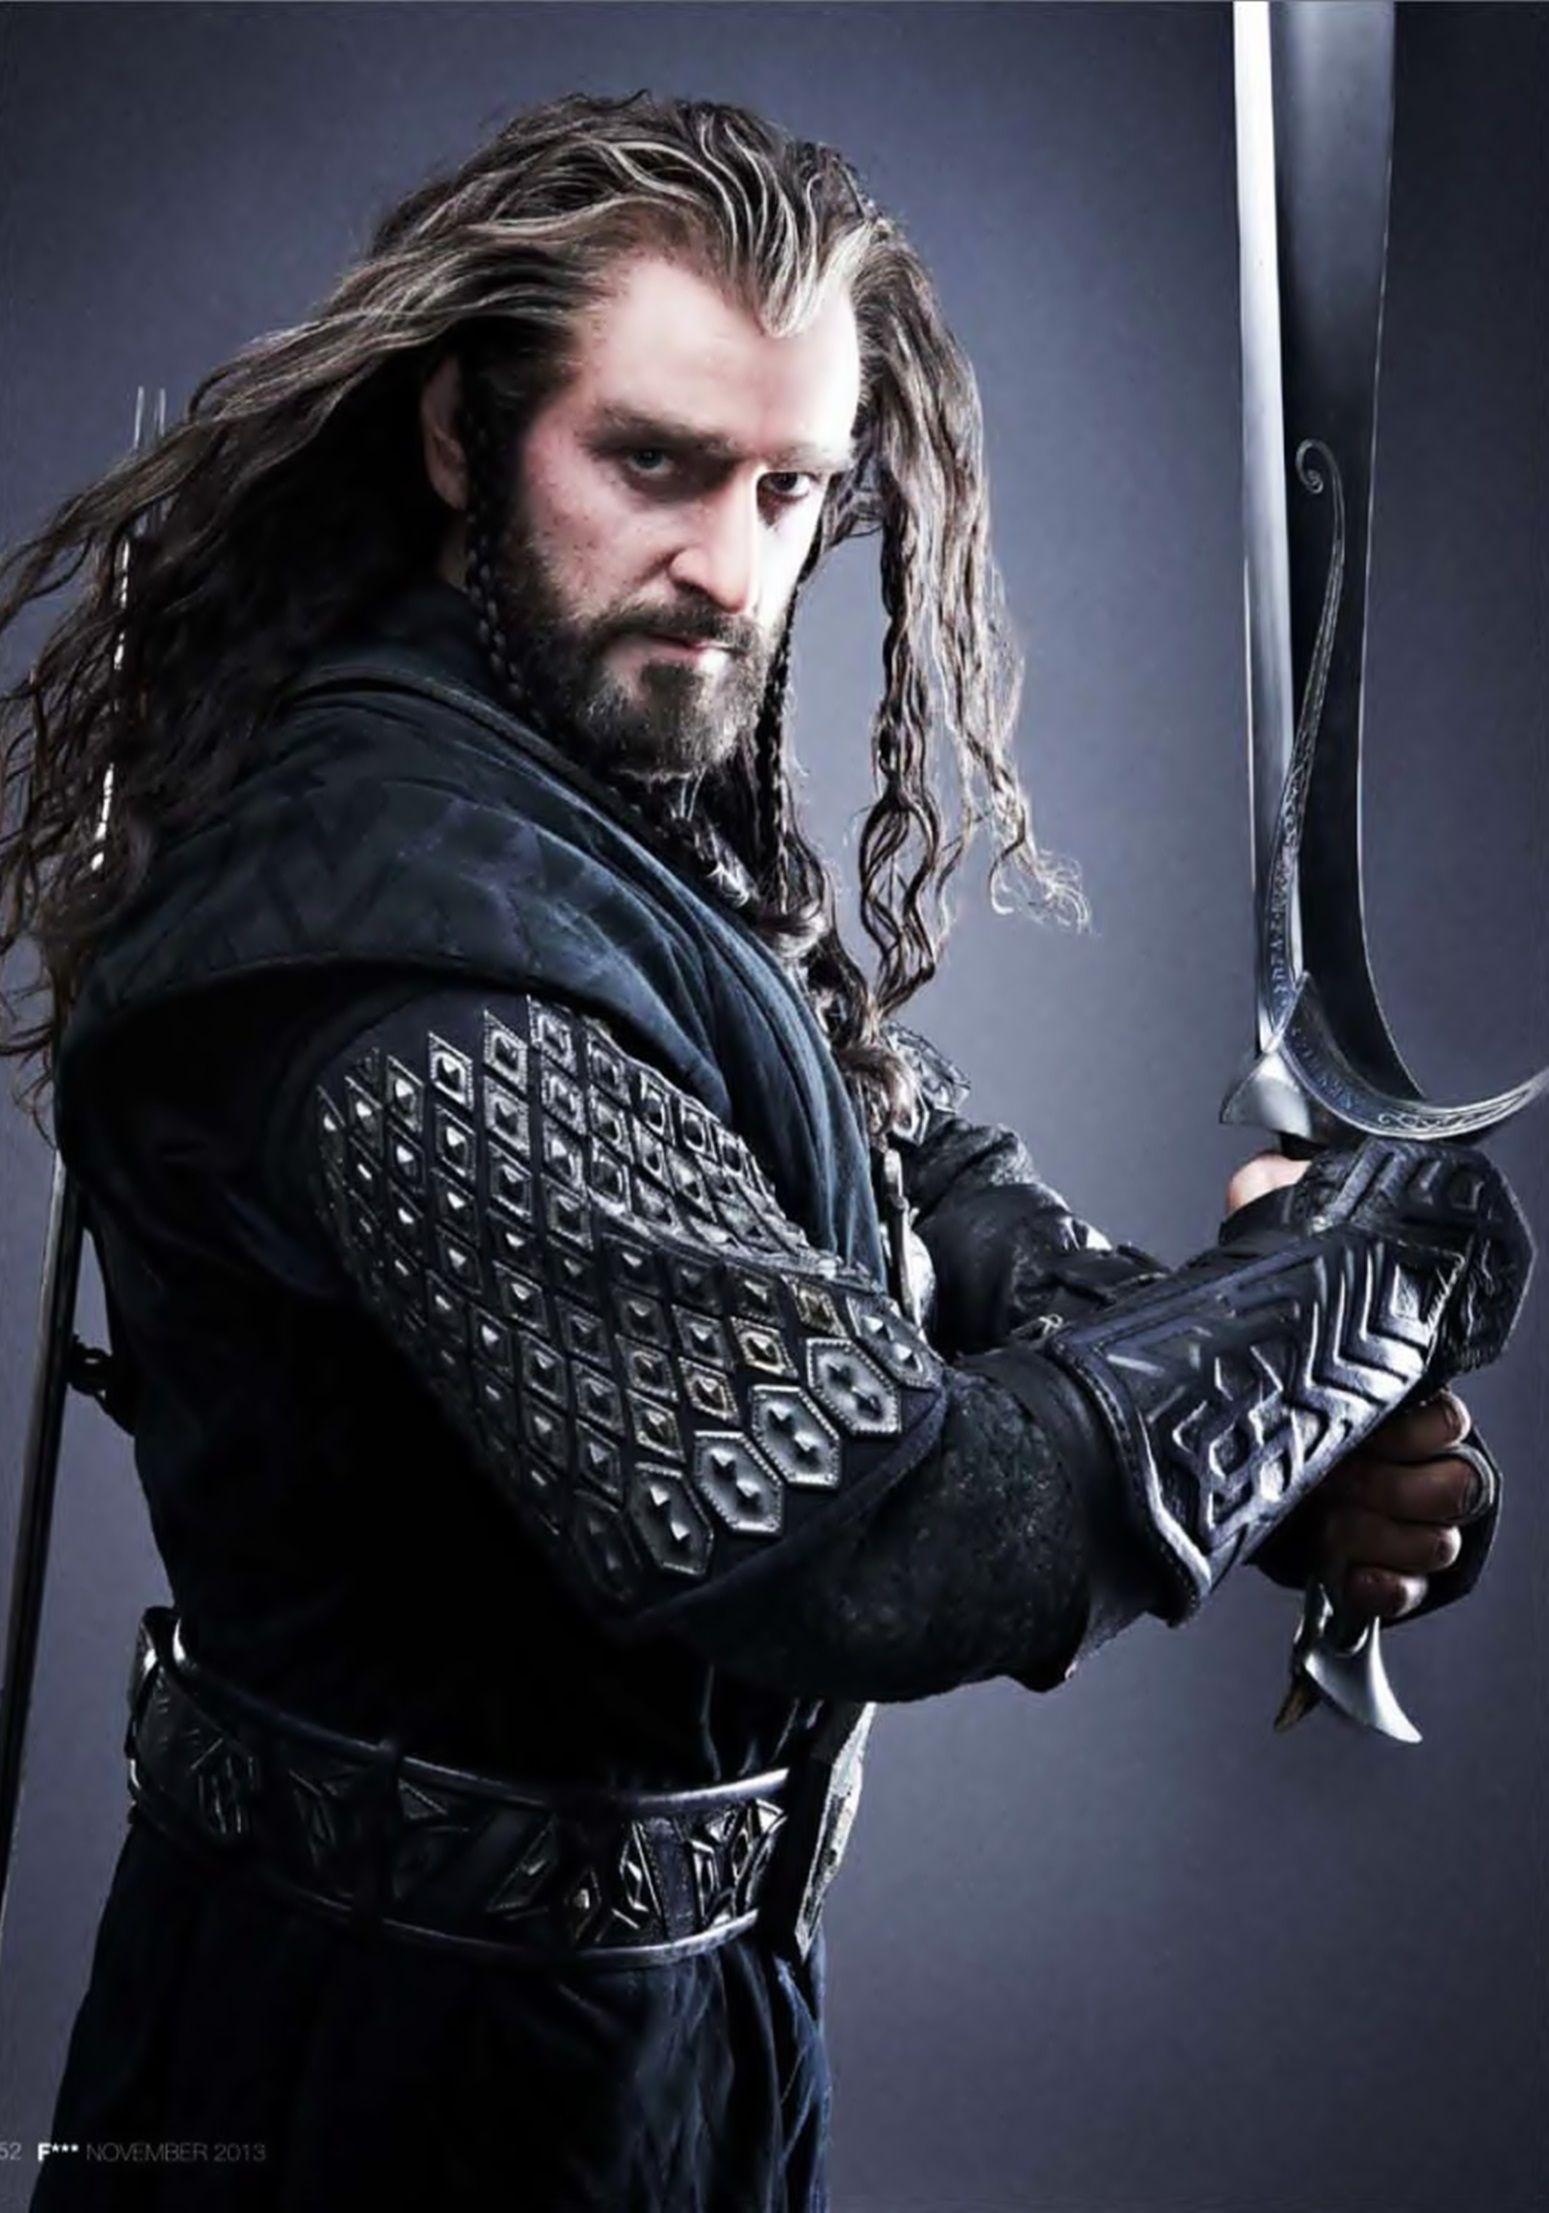 Richard Armitage/The Hobbit